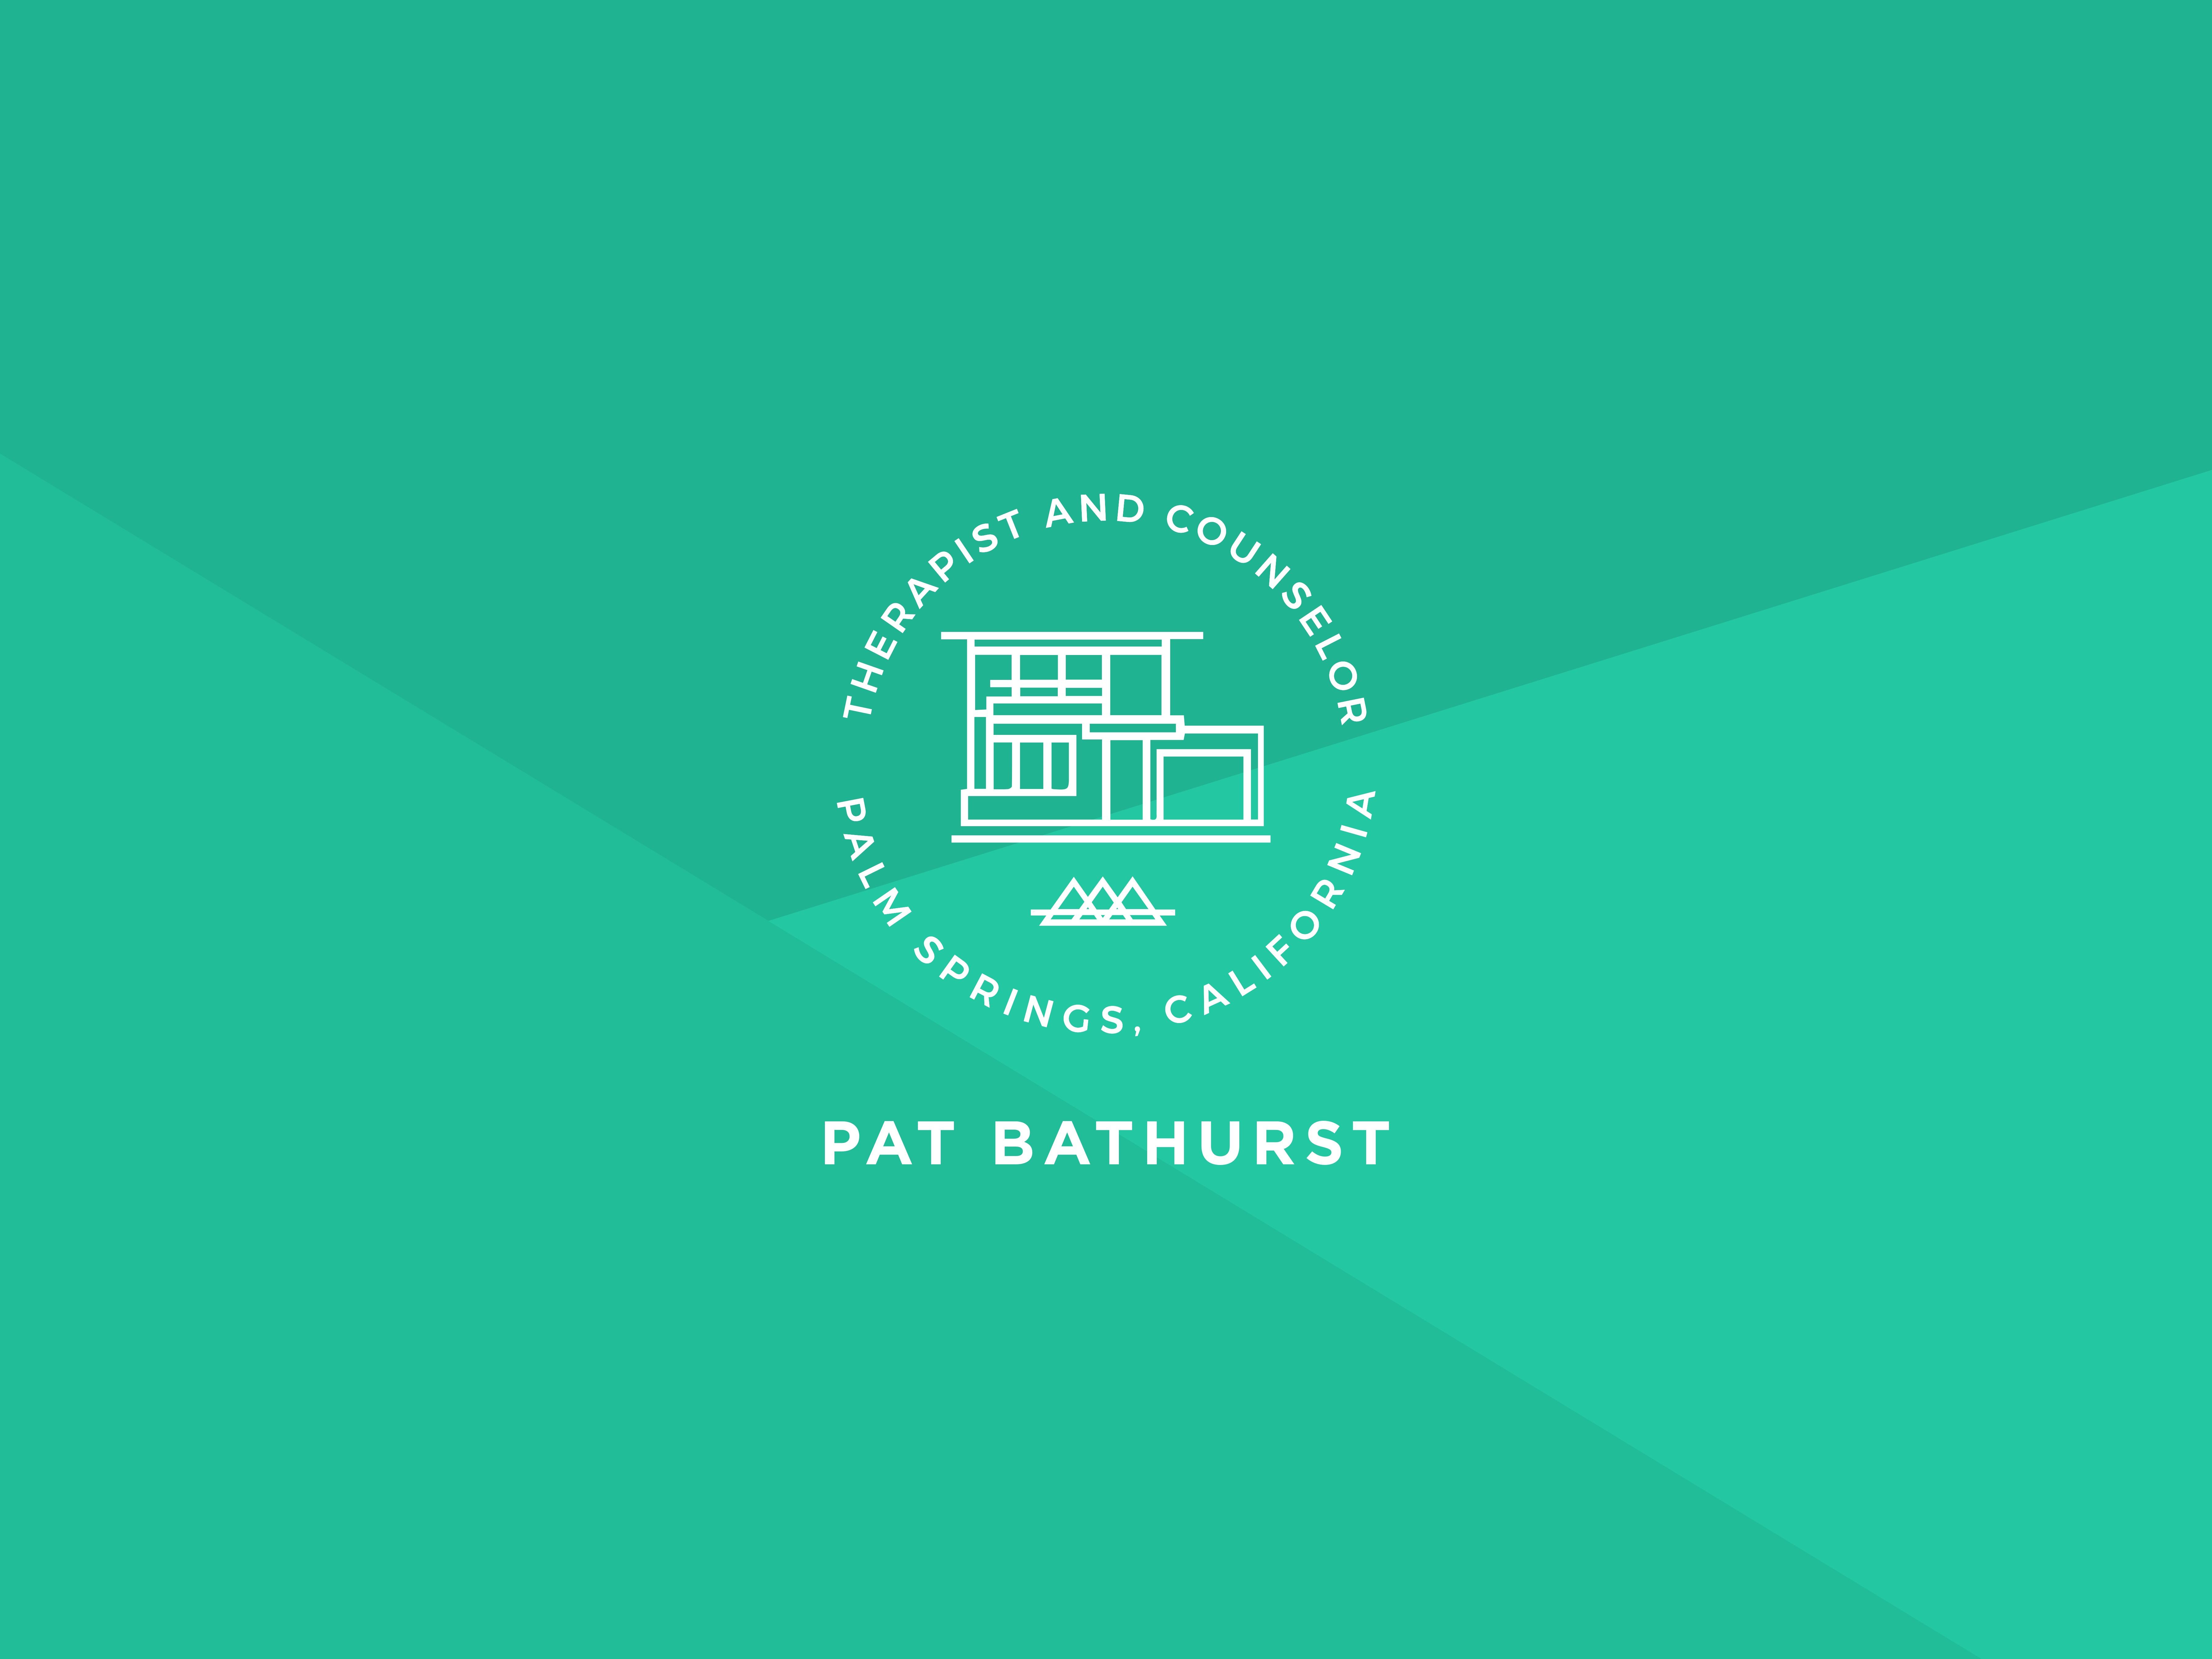 Pat Bathurst